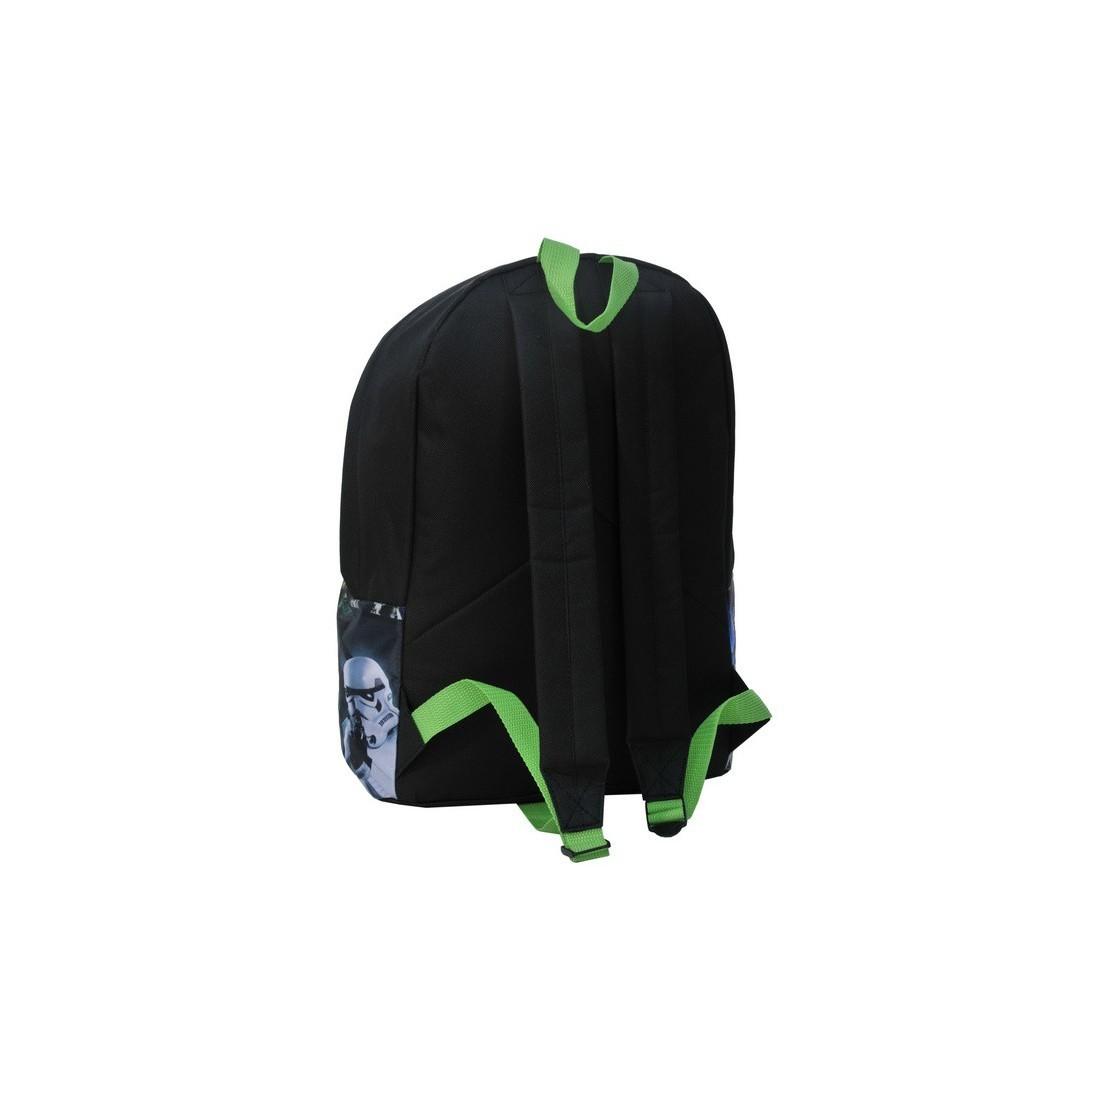 Plecak Star Wars - plecak-tornister.pl